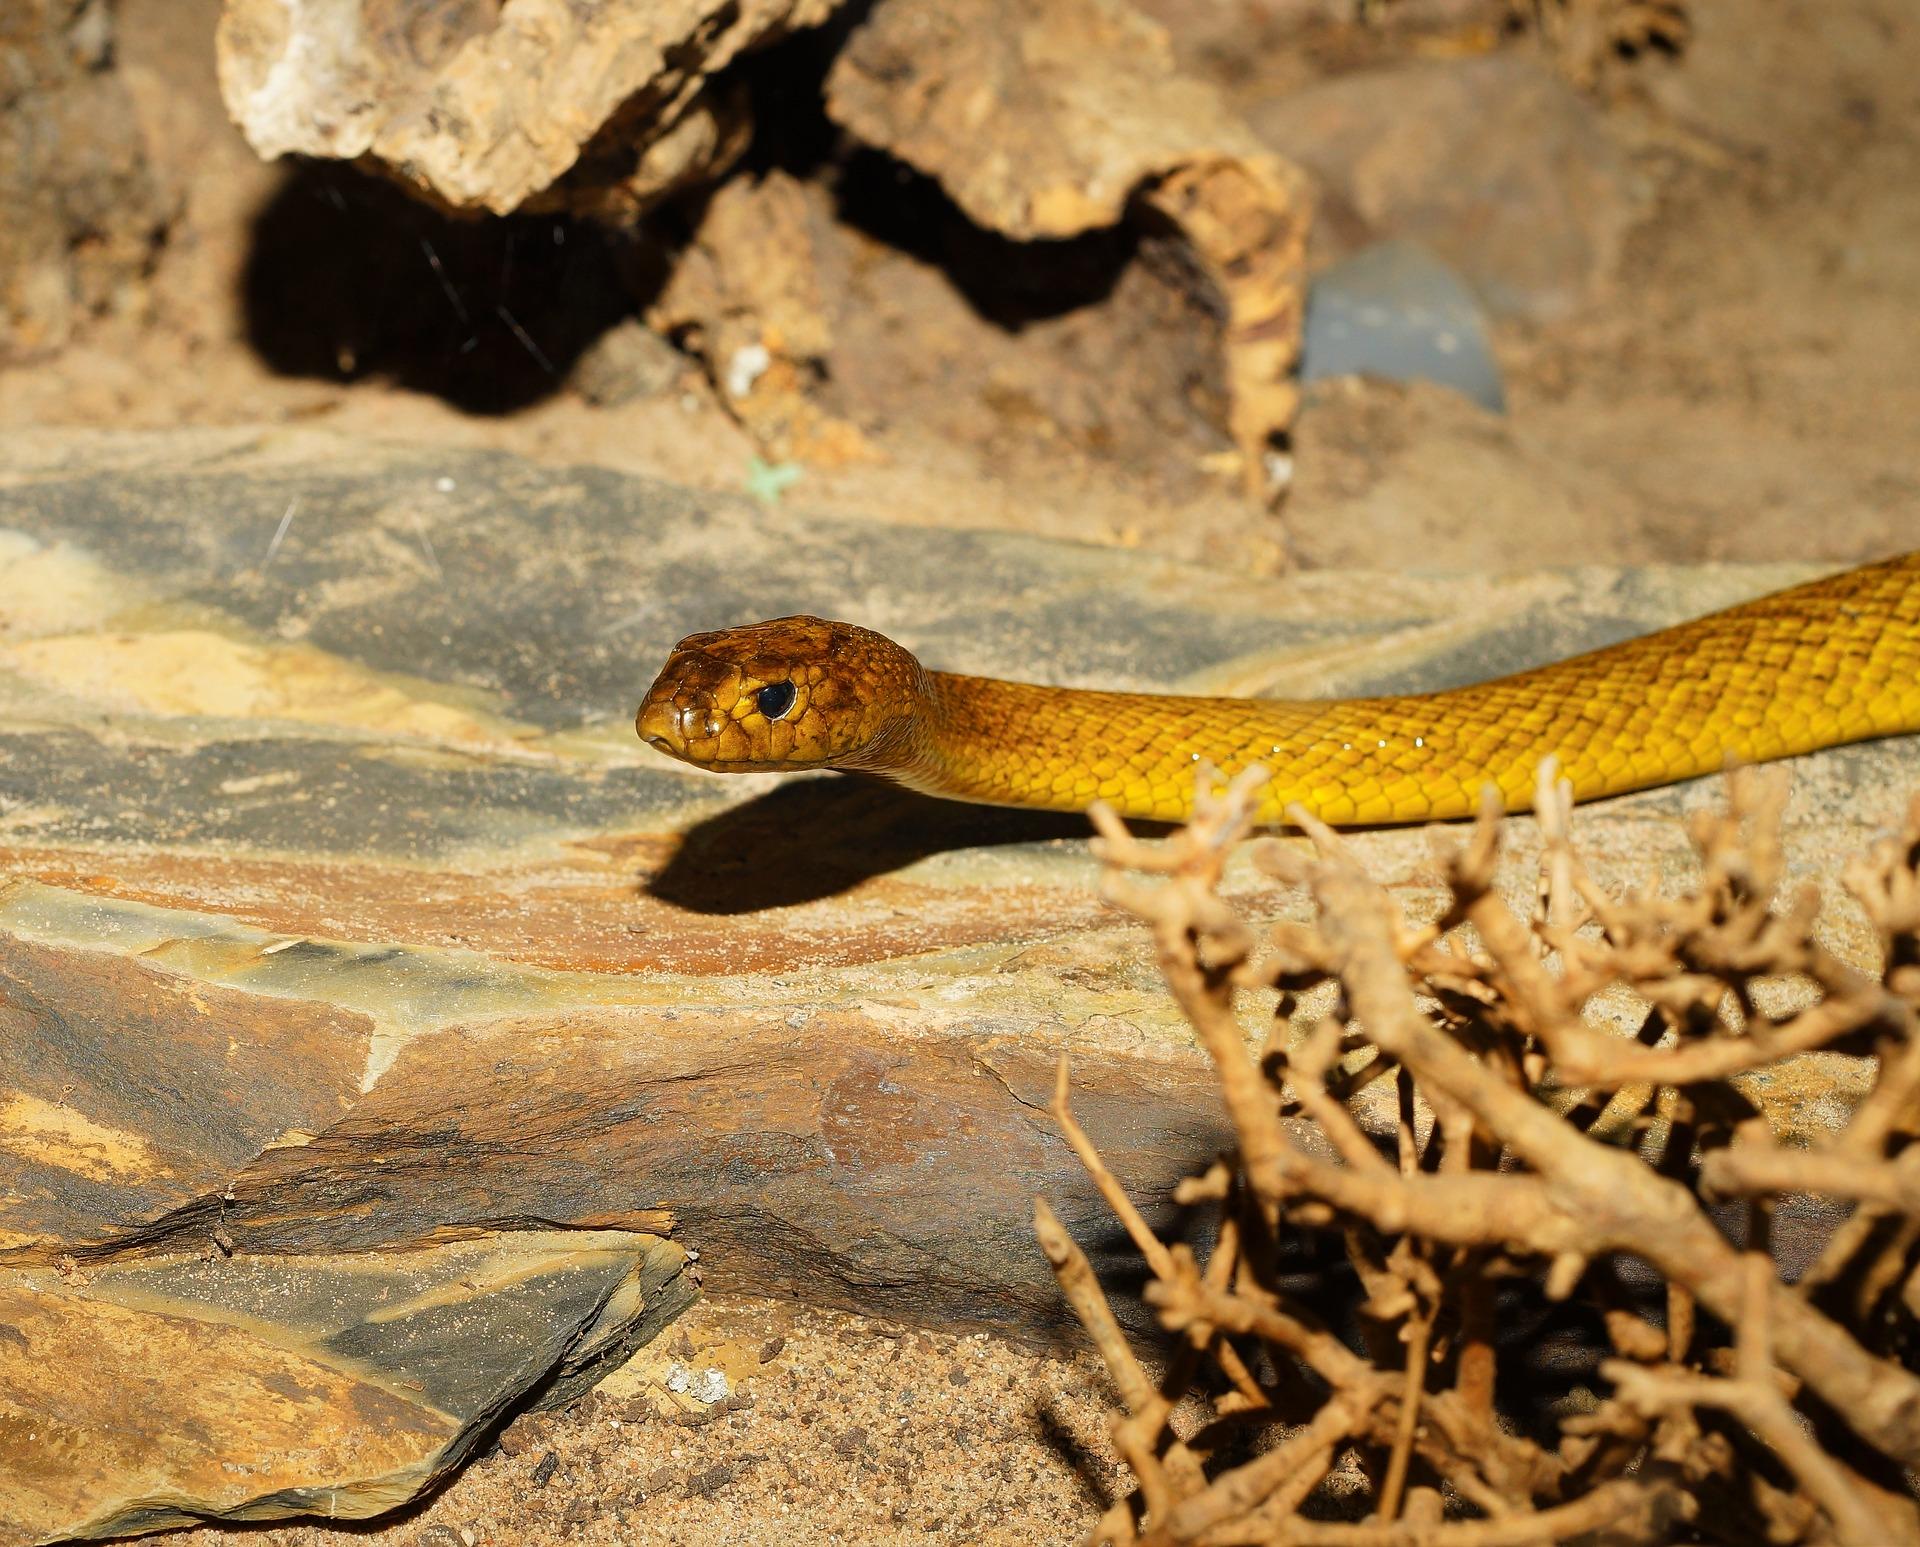 Hábitat de la serpiente taipan